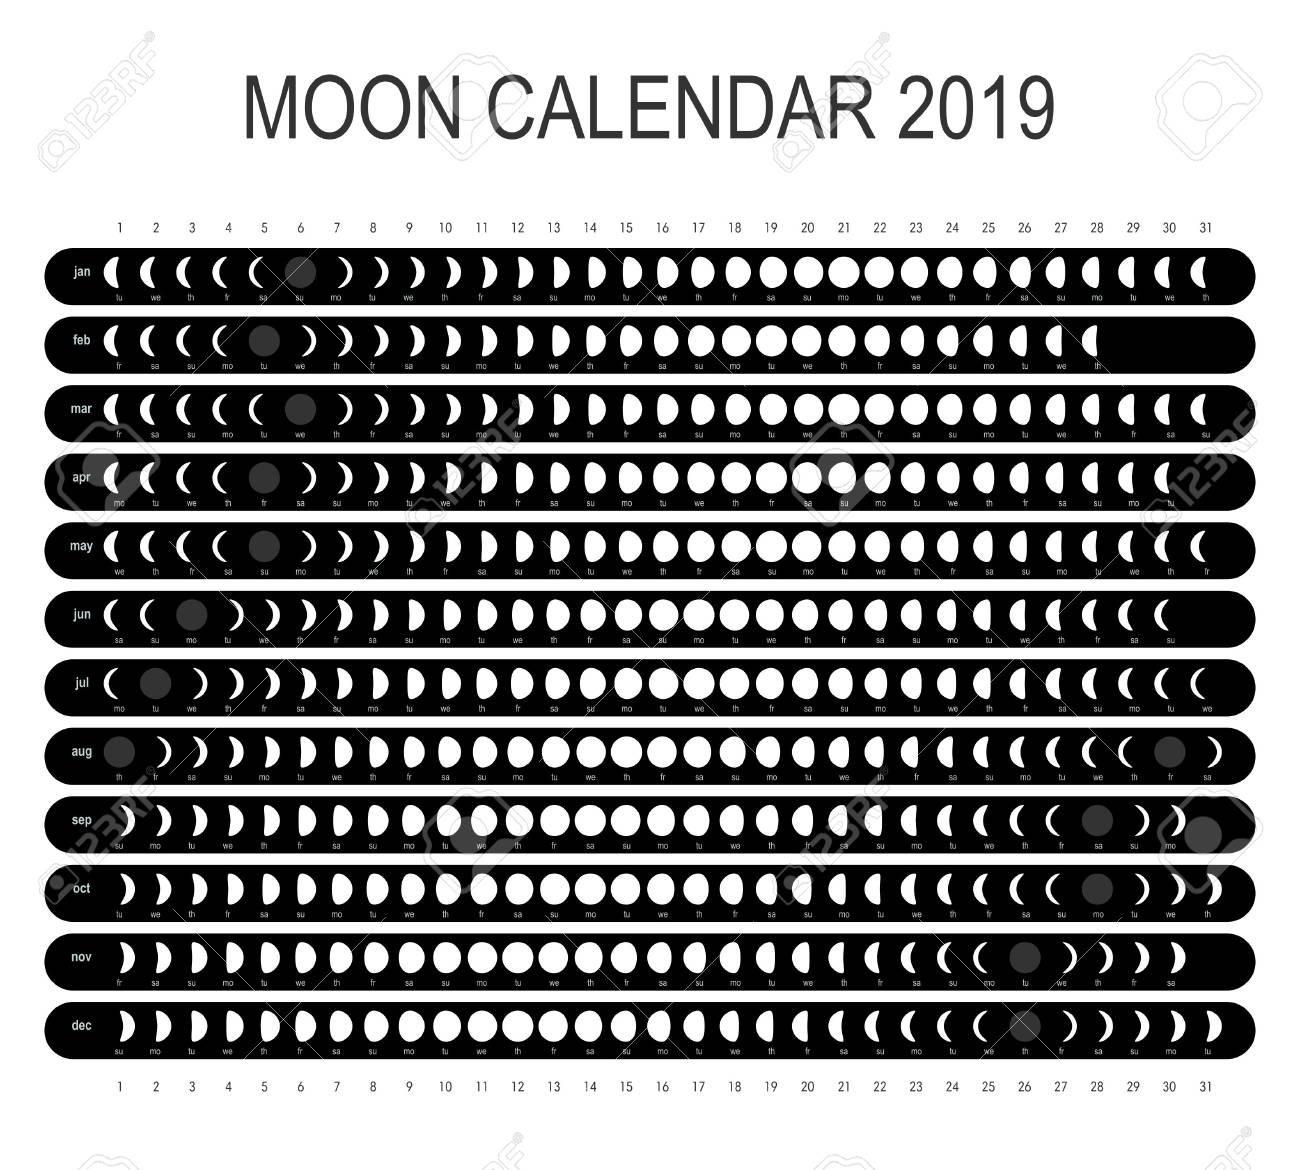 Moon Calendar 2019 Royalty Free Cliparts, Vectors, And Stock Calendar 2019 Lunar